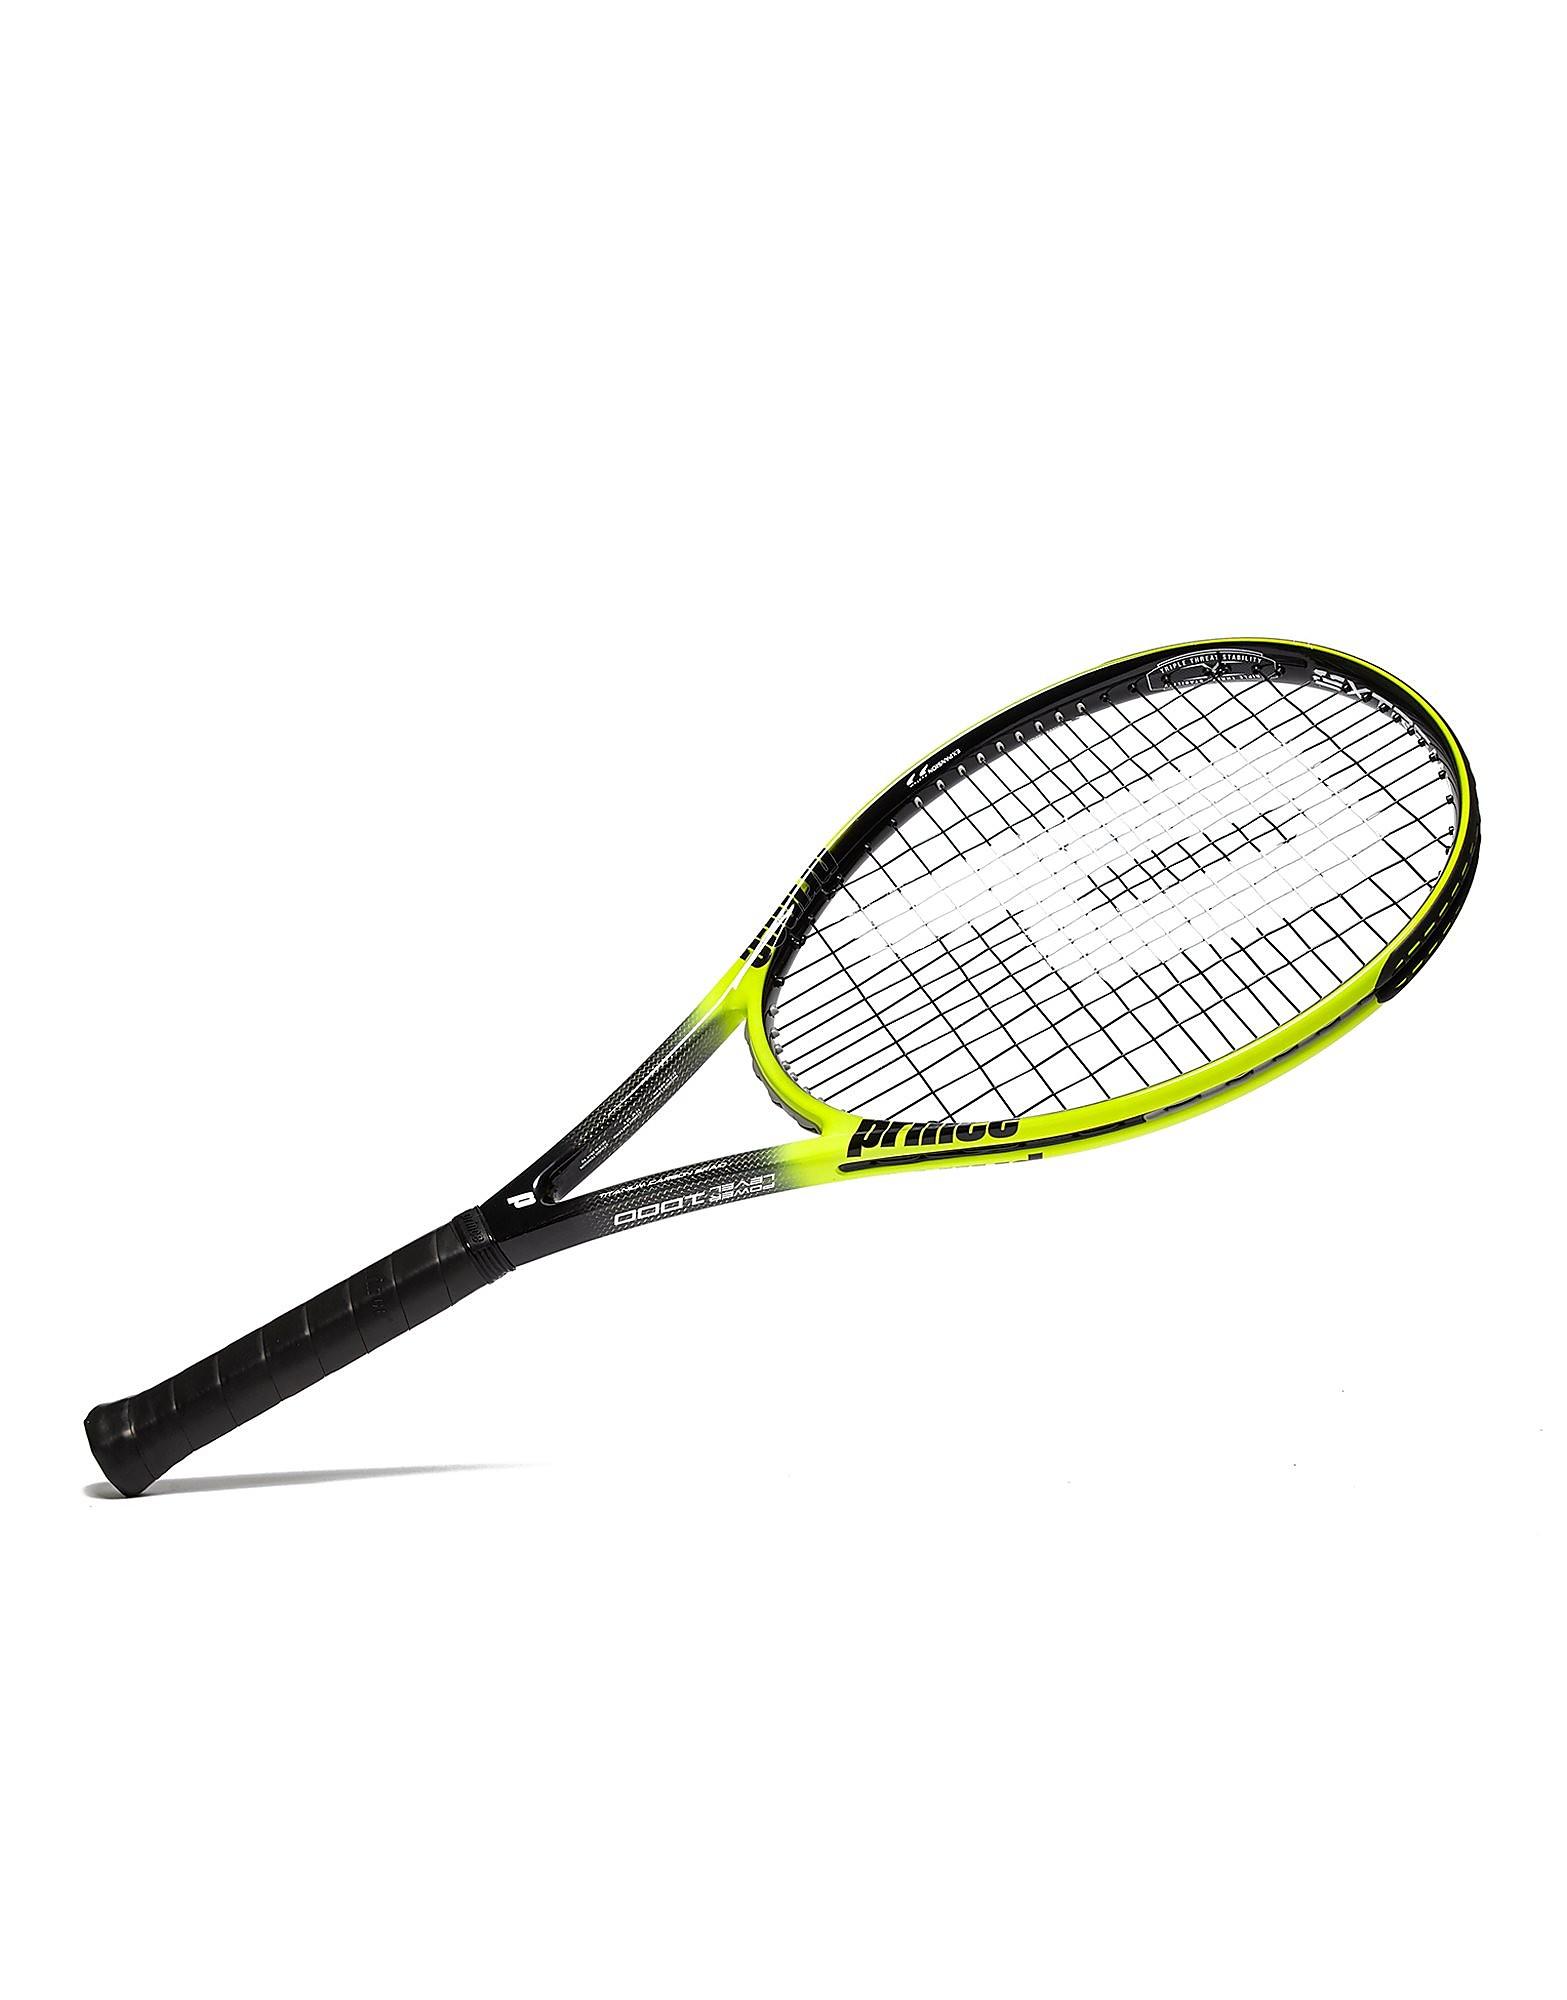 Prince Thunder Blast 105 Tennis Racquet